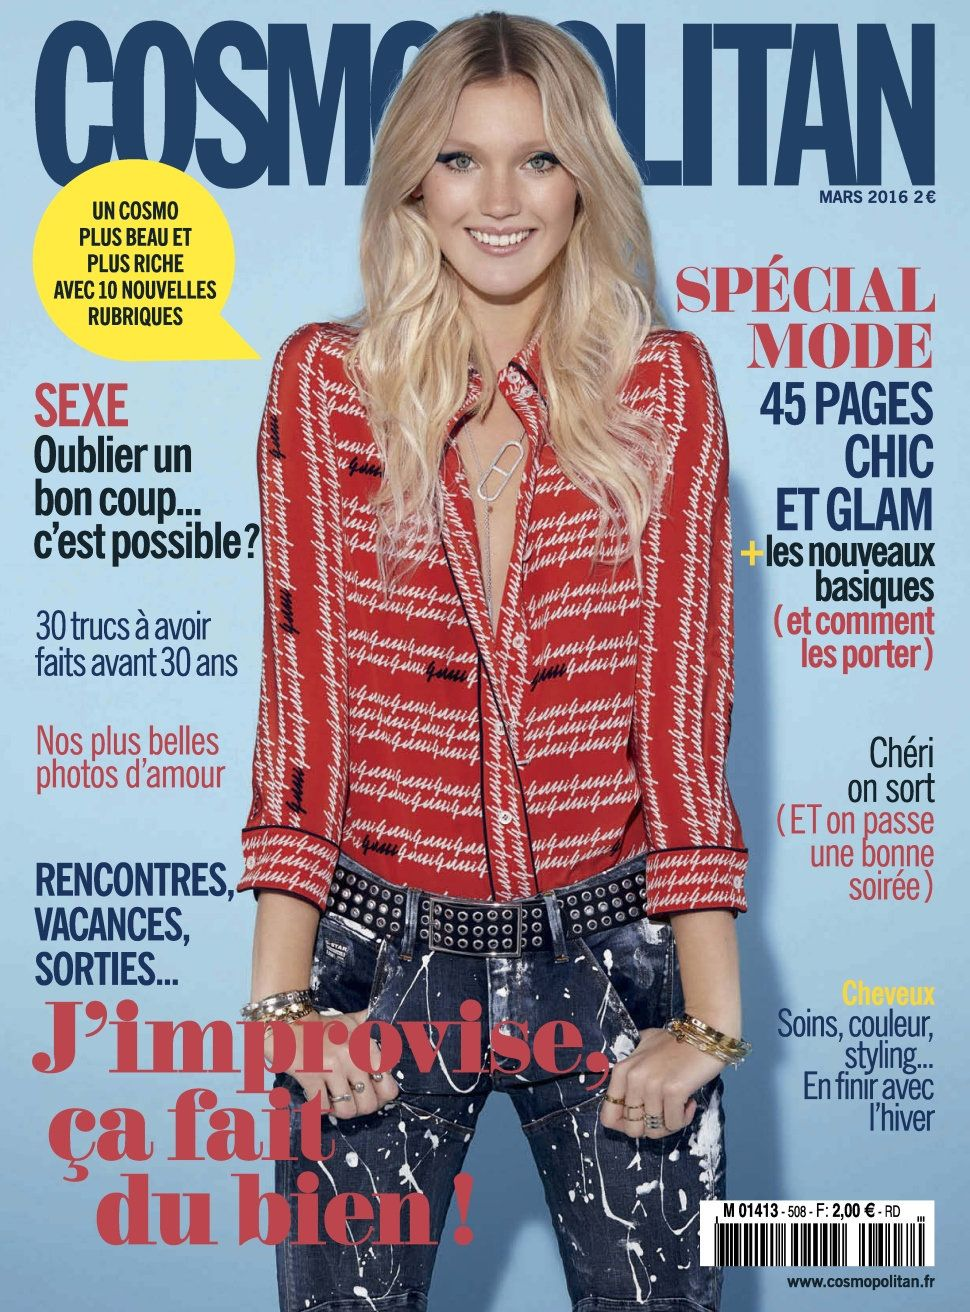 Cosmopolitan 508 - Mars 2016